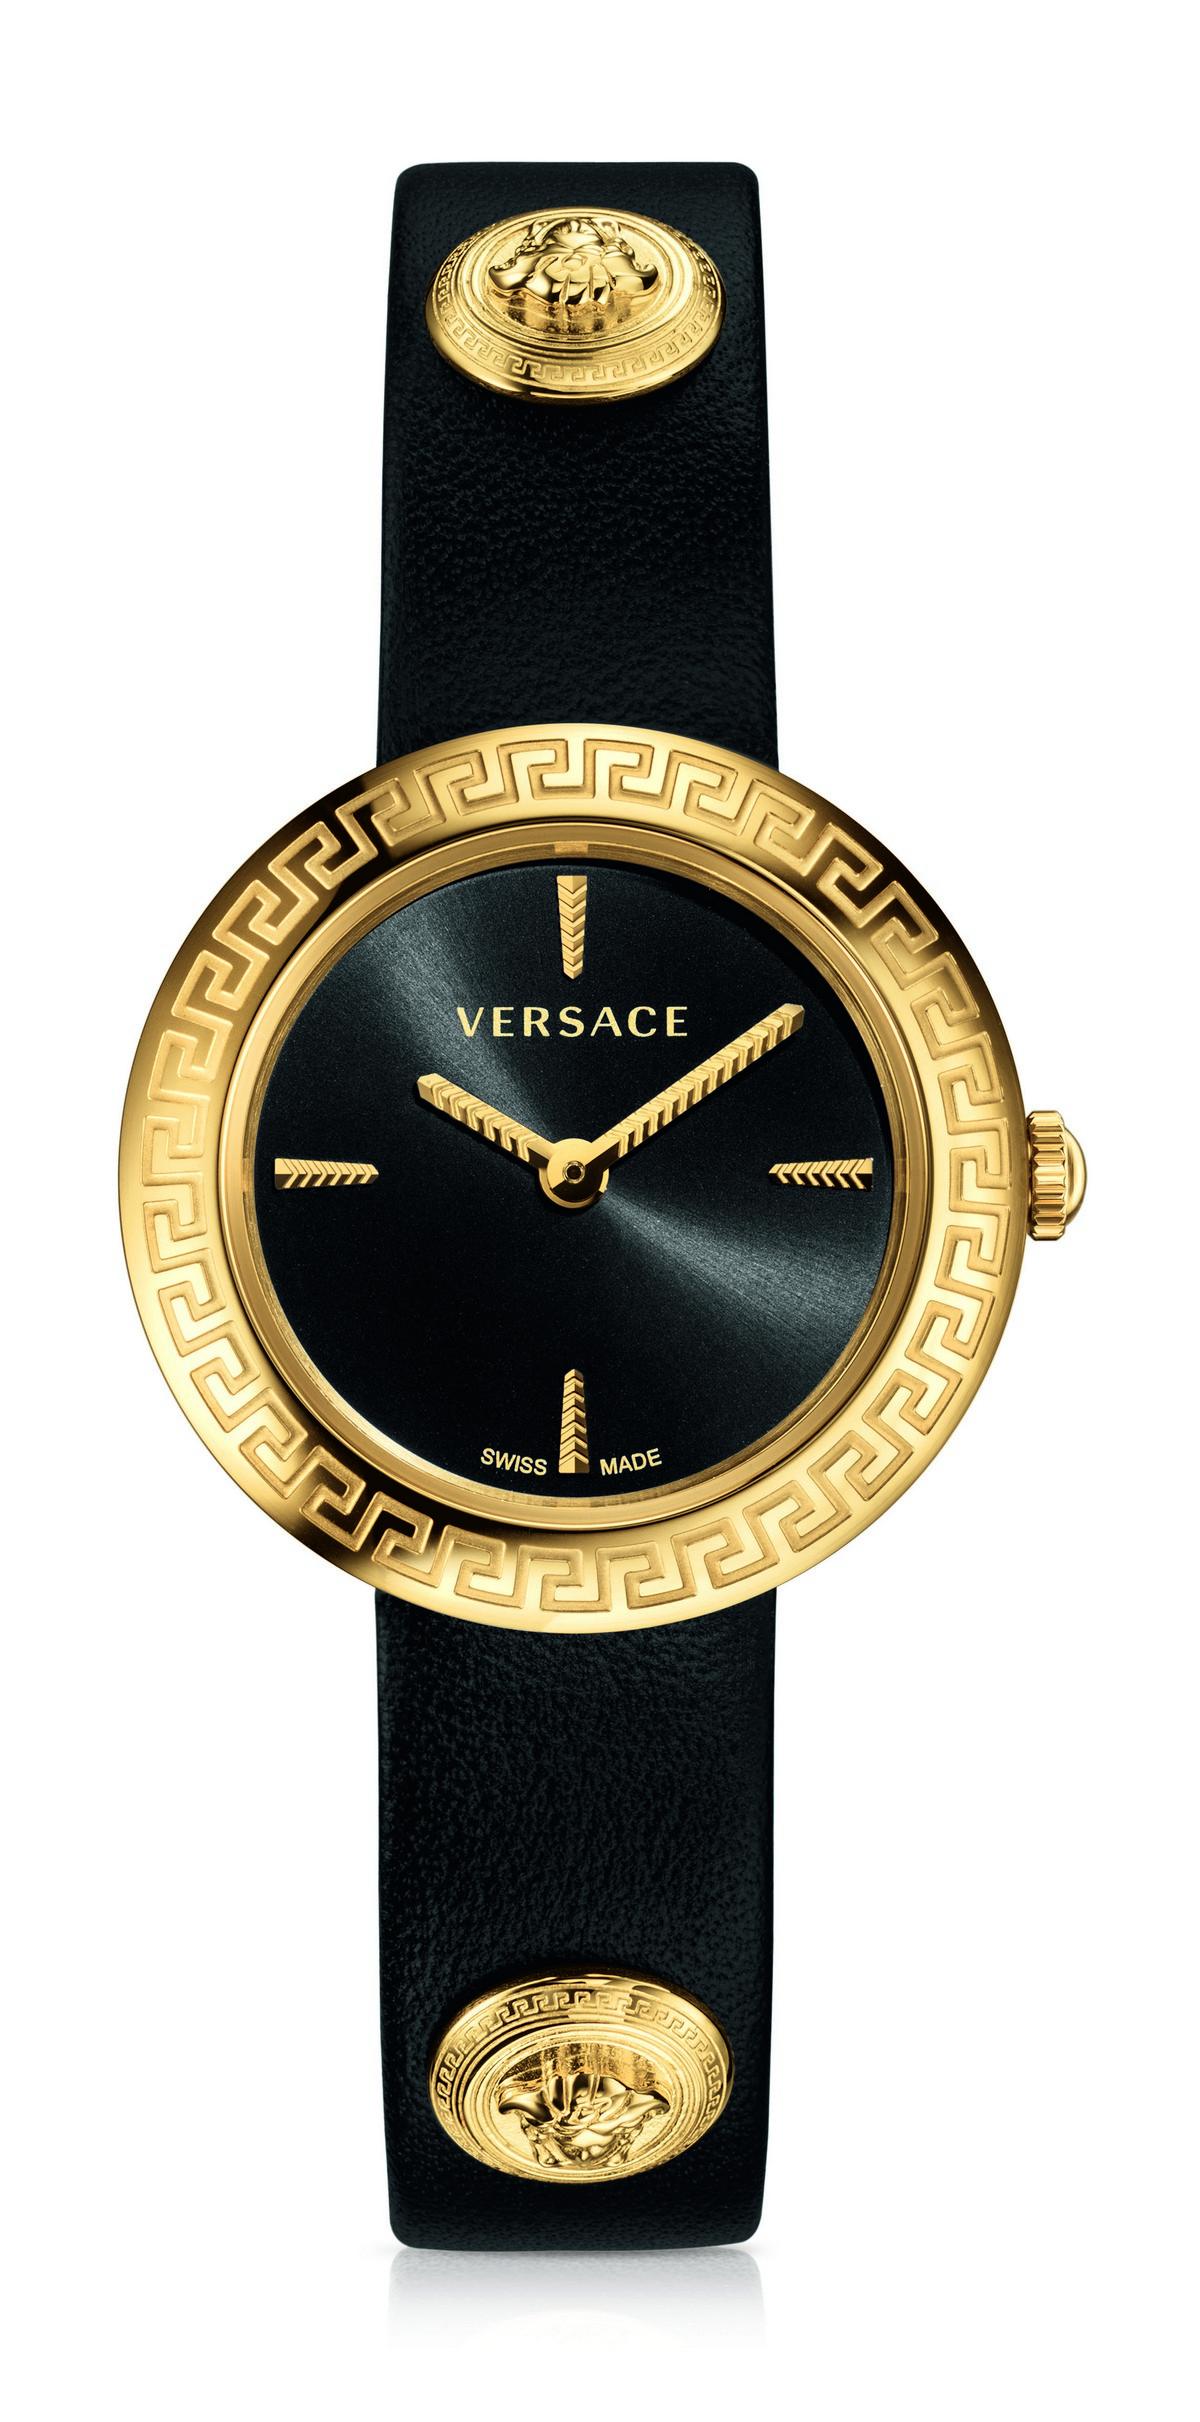 Versace orologi autunno inverno 2018 2019